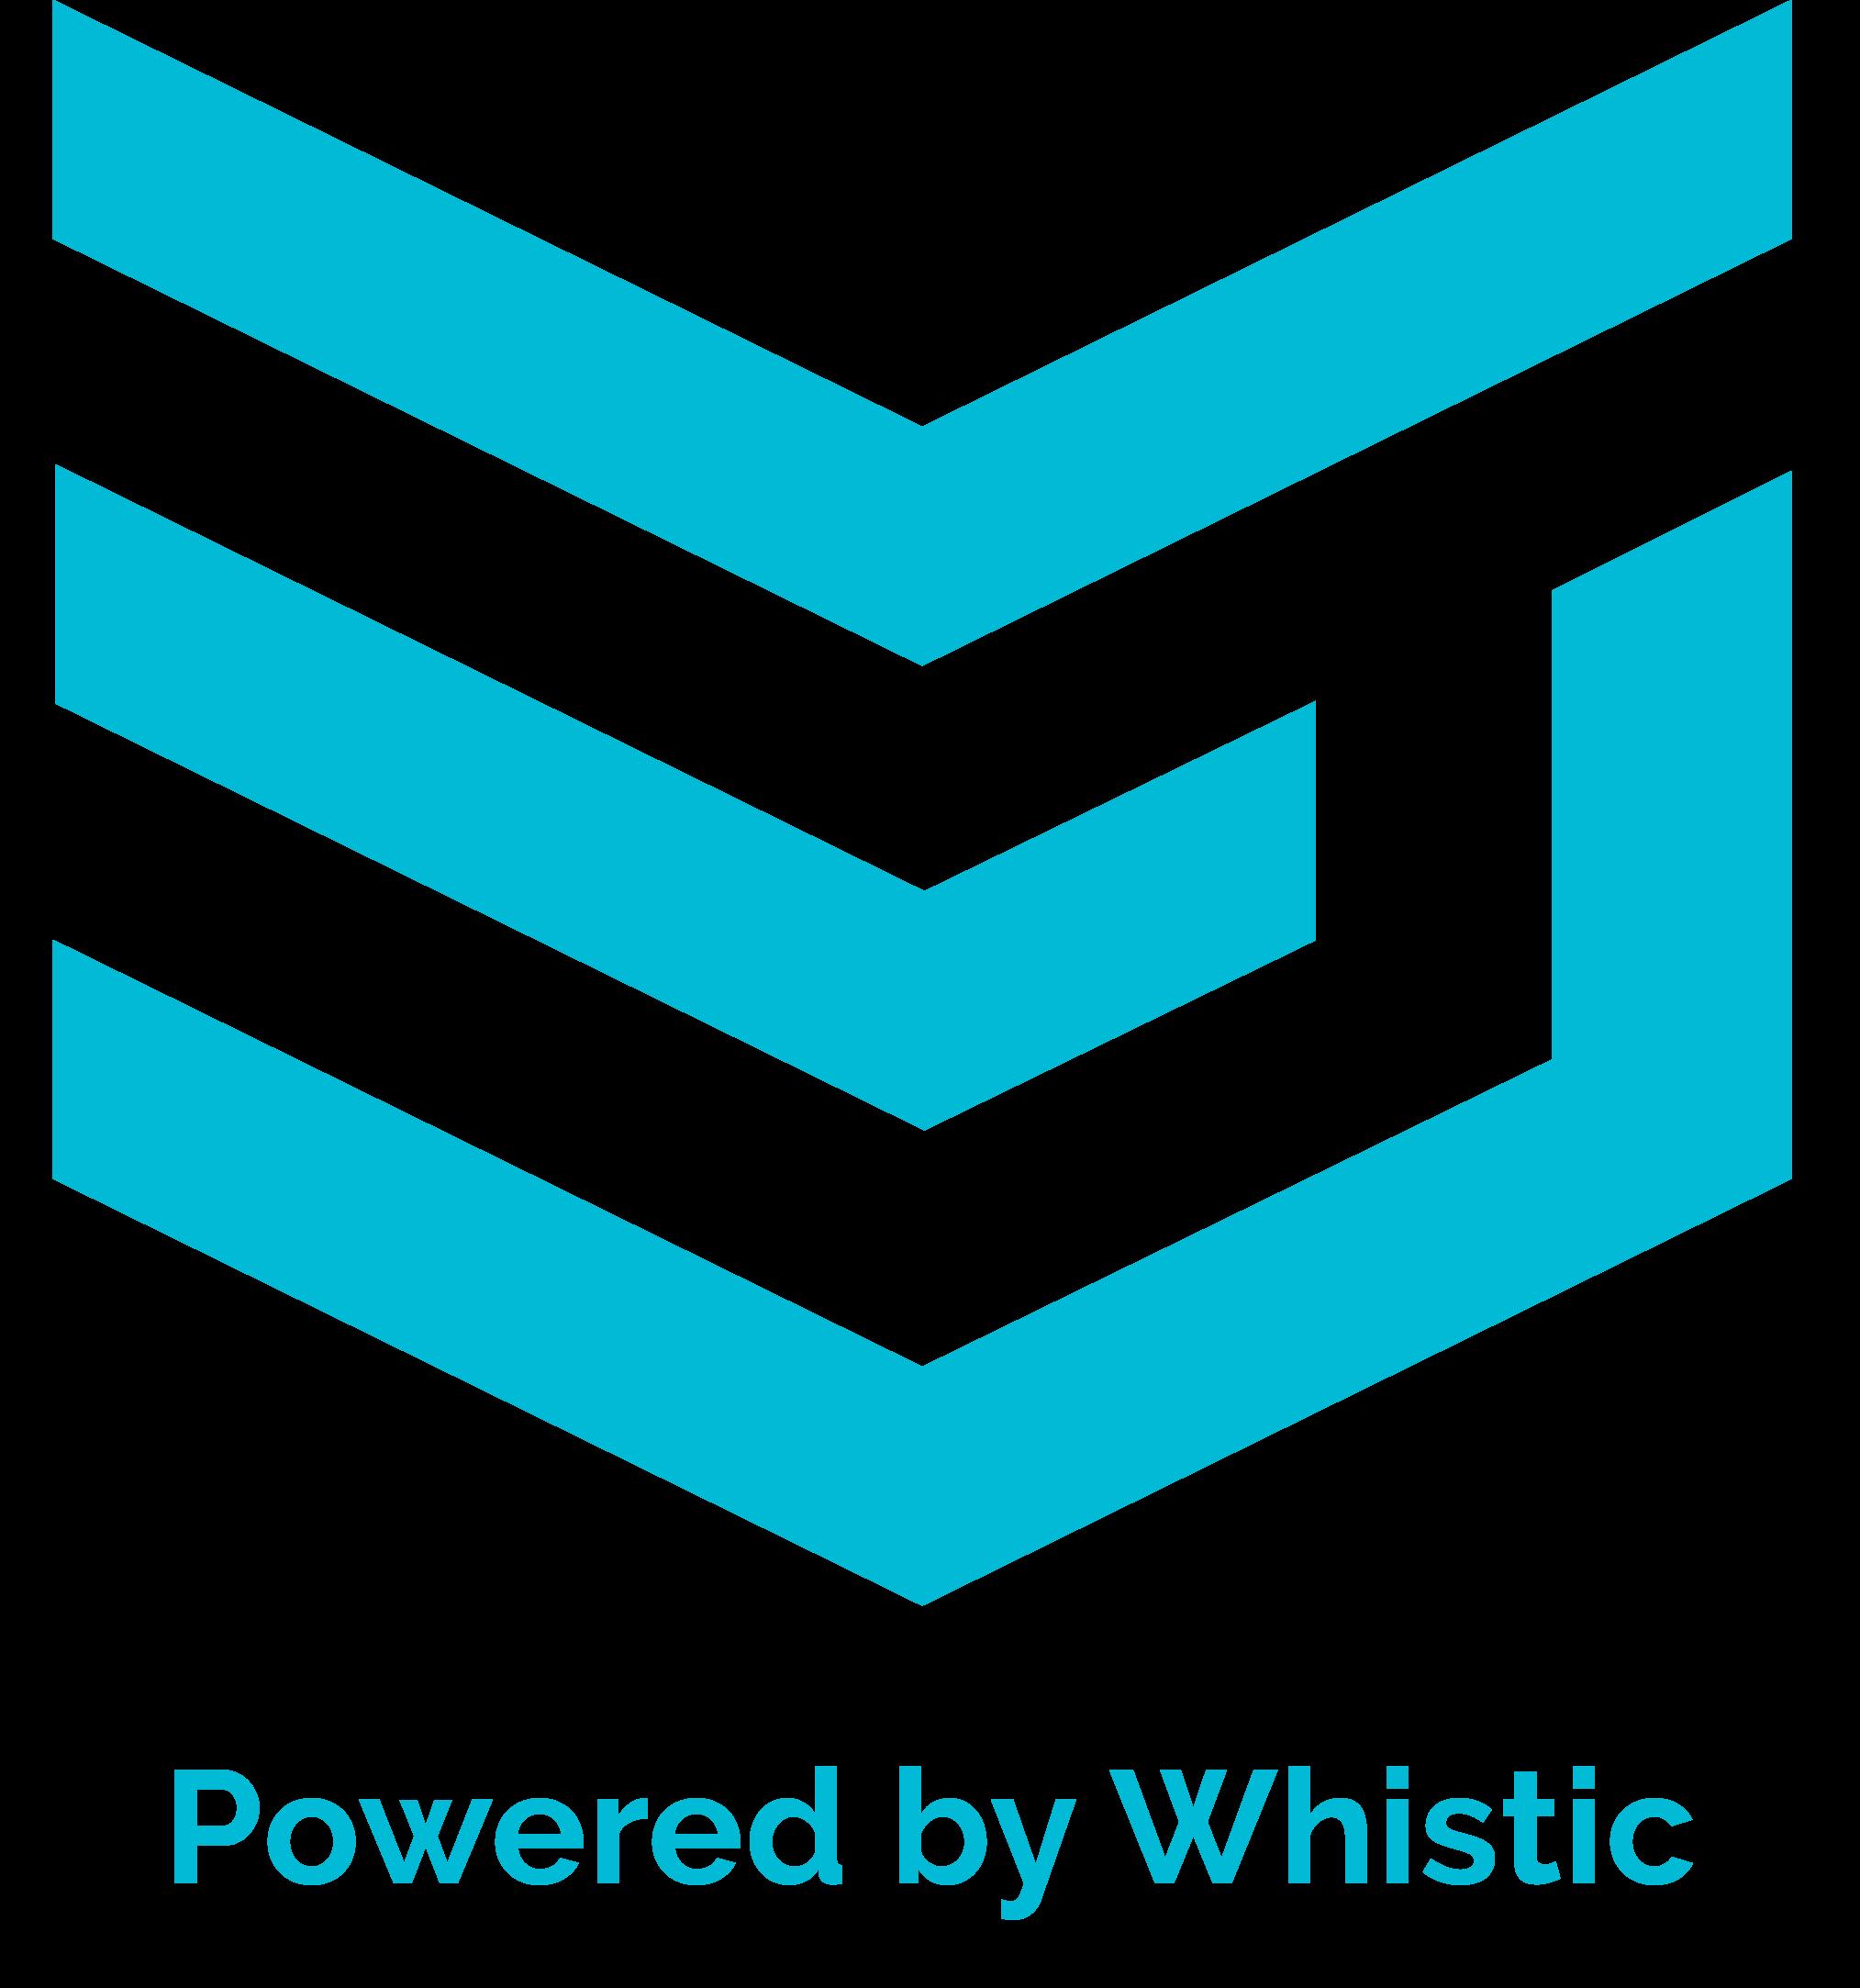 Logotipo de CyberGRX